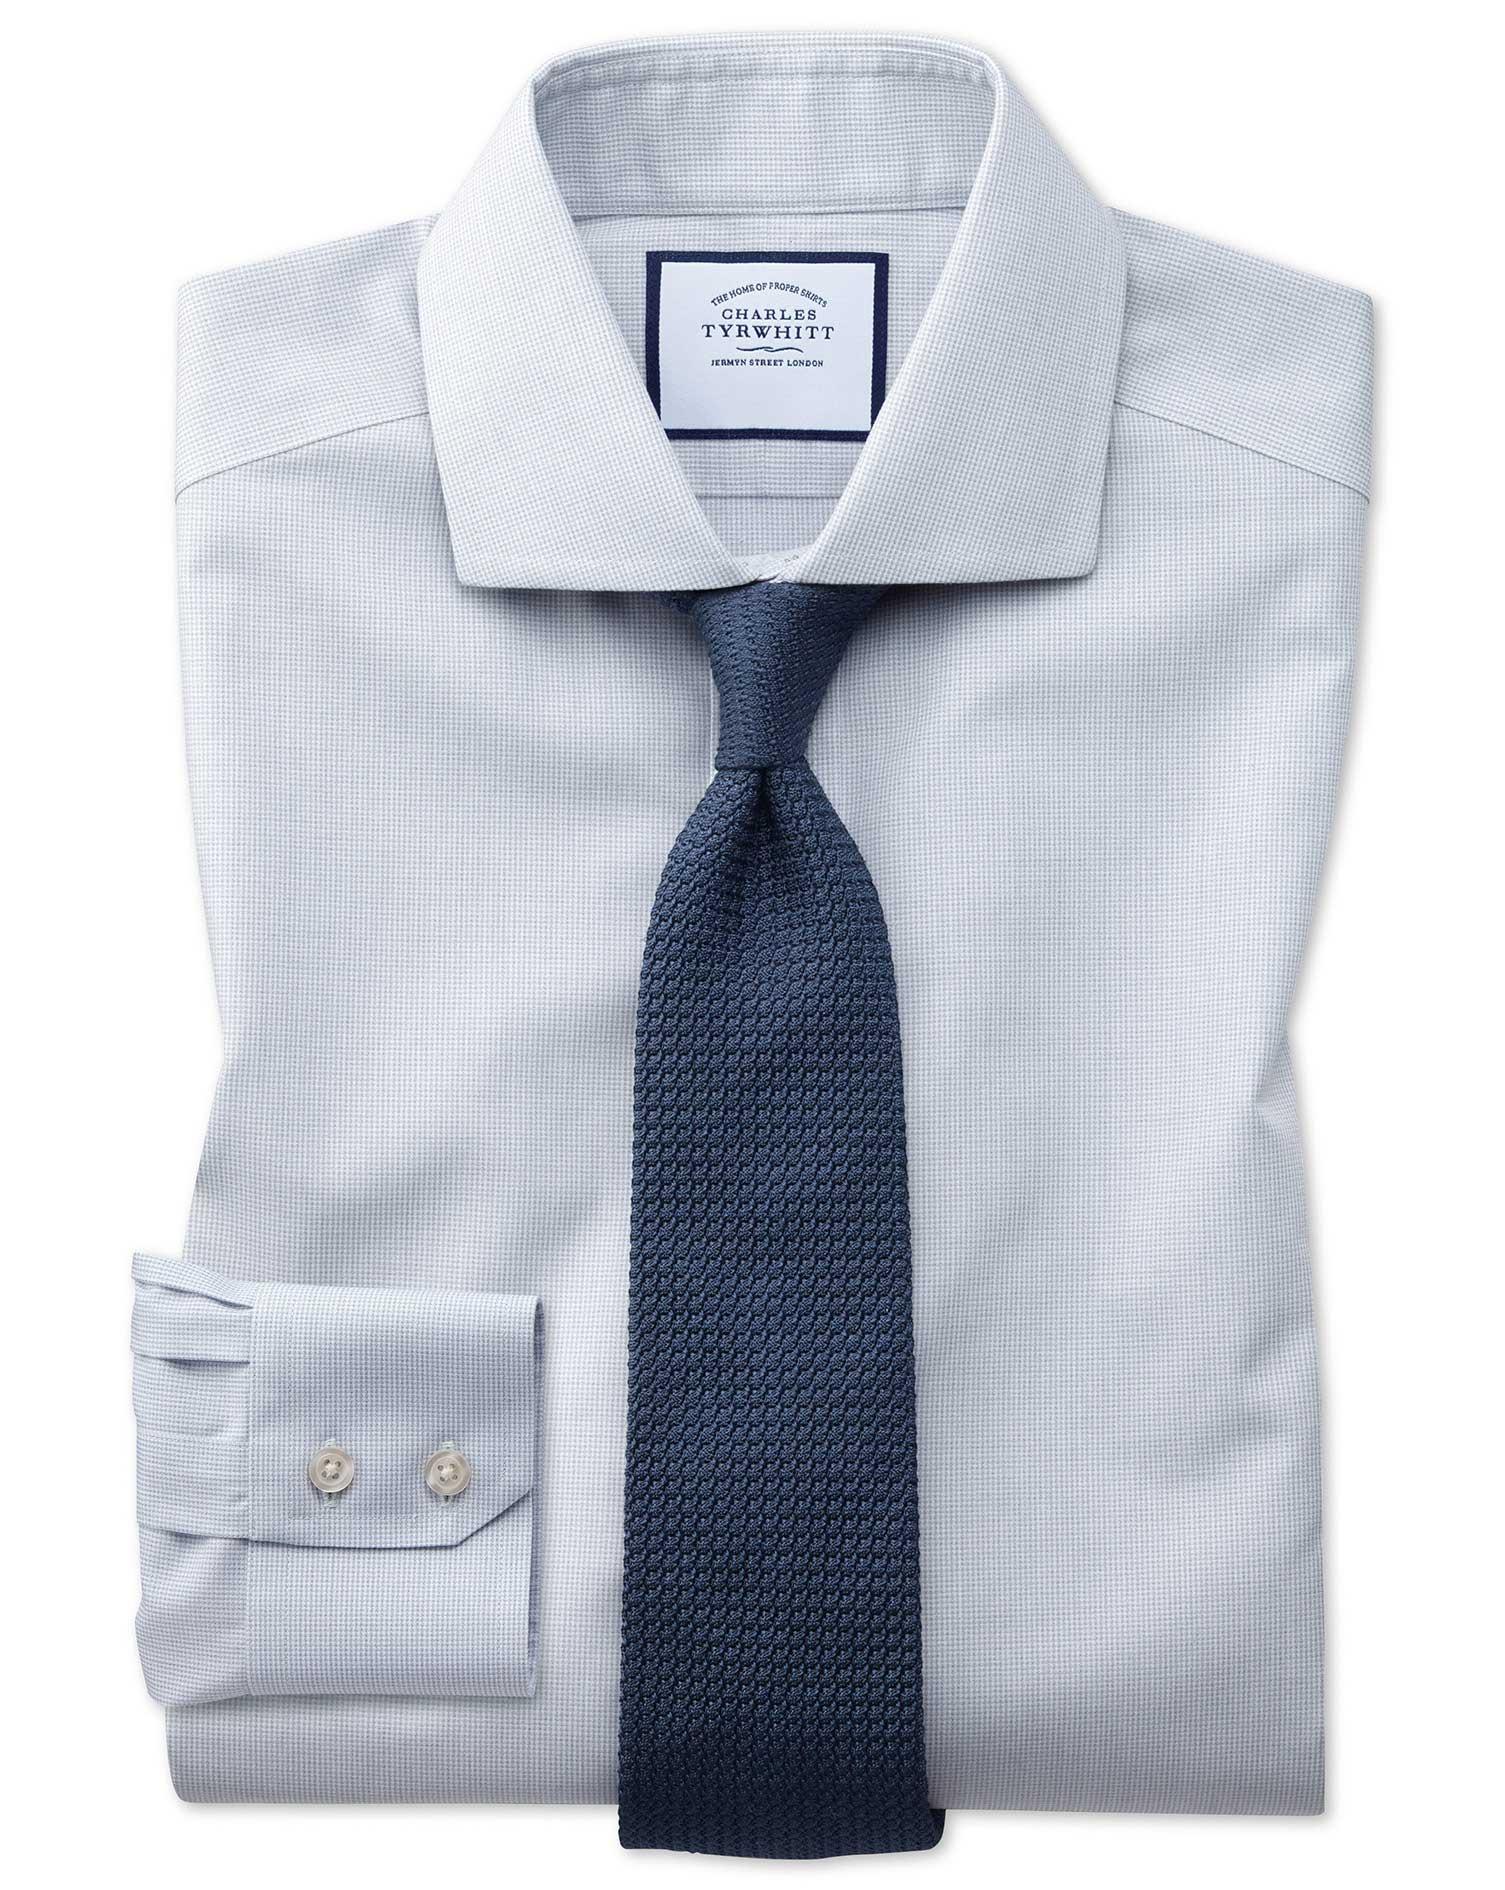 Extra Slim Fit Non-Iron Cutaway Collar Grey Puppytooth Cotton Formal Shirt Single Cuff Size 15.5/34